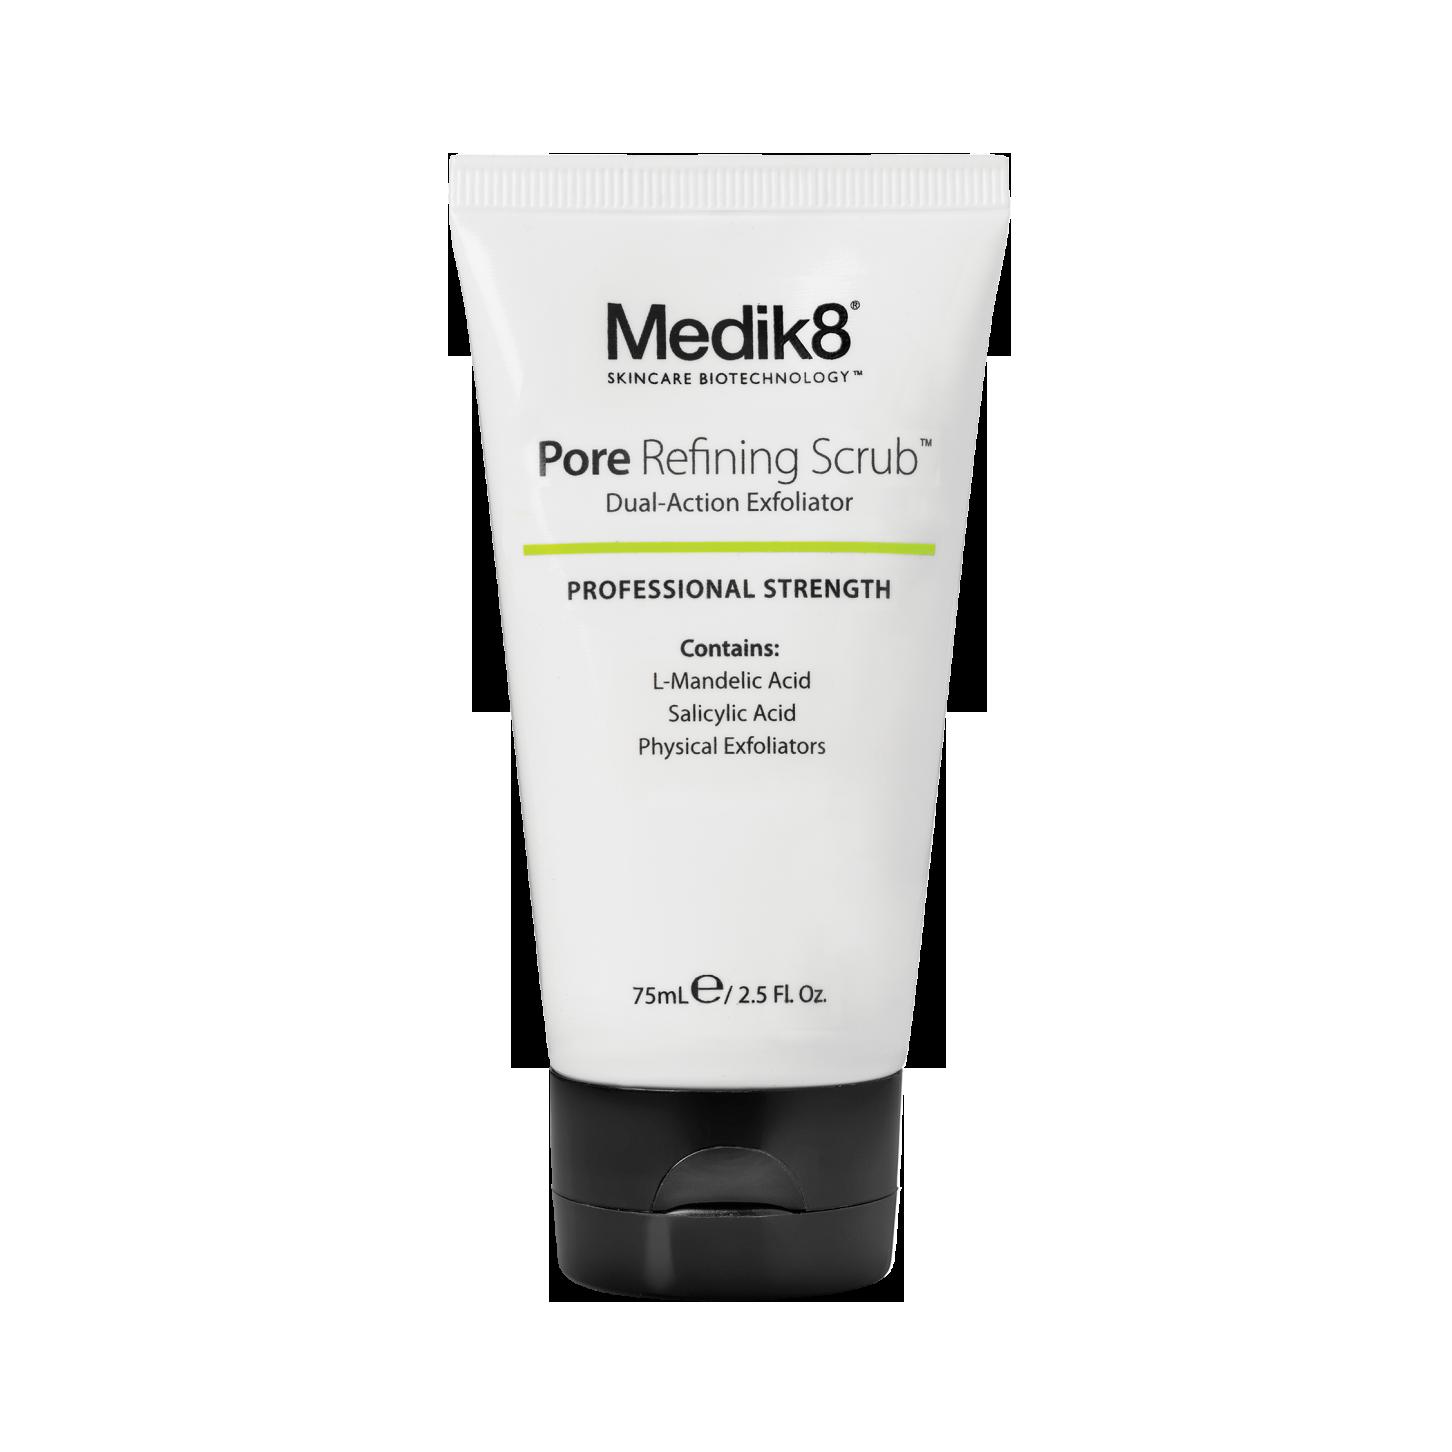 Medik8 Pore Refining Scrub Dual-Action Exfoliator